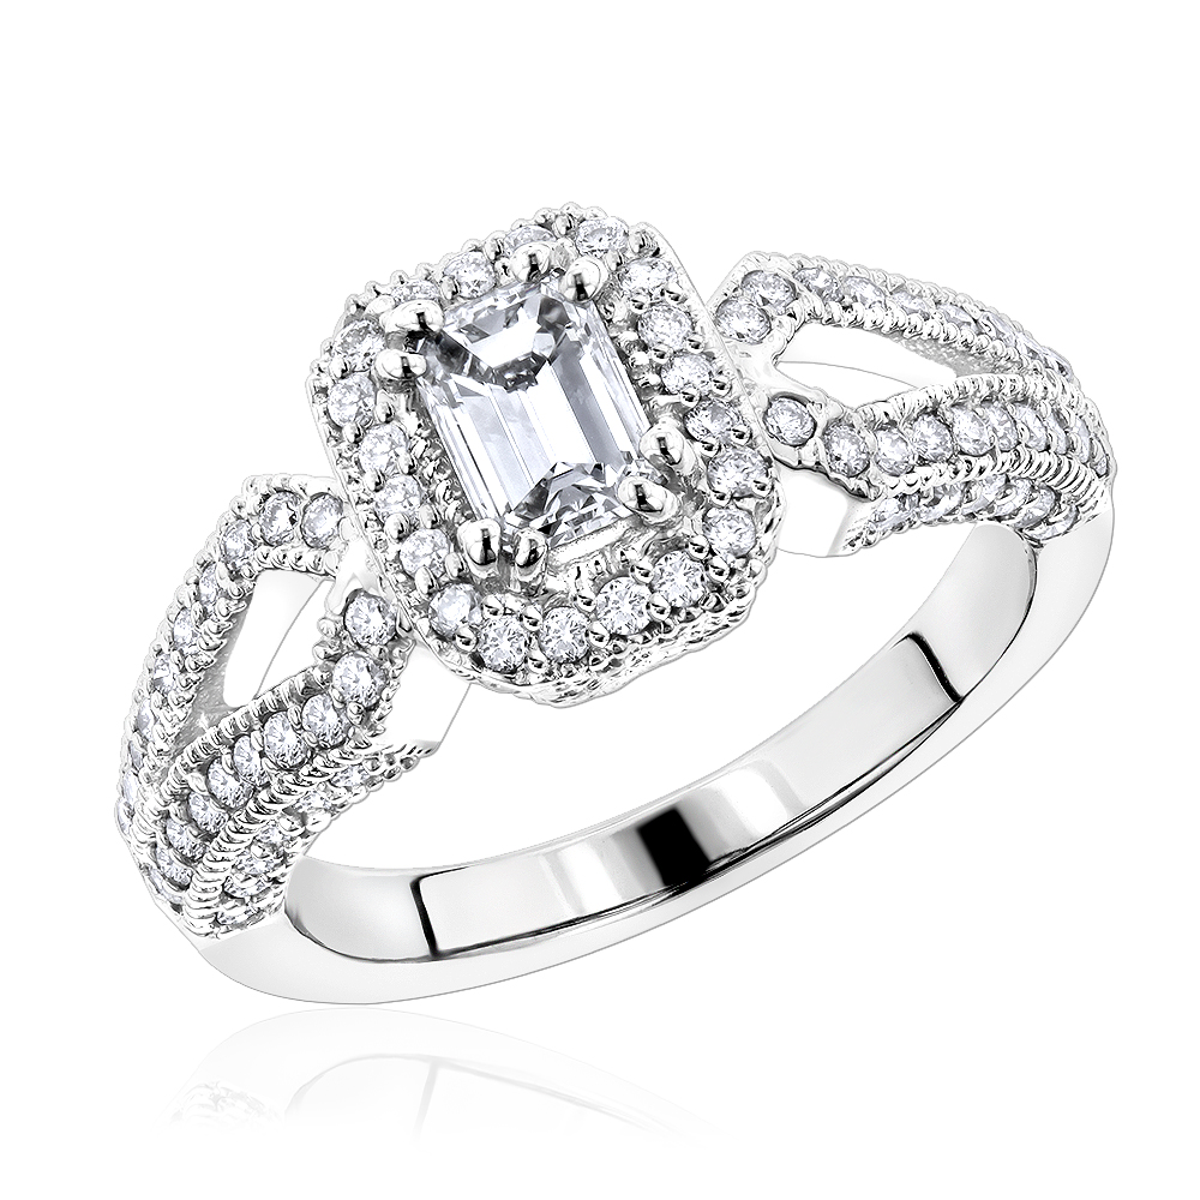 14K Gold Unique Diamond Engagement Ring 1.05ct